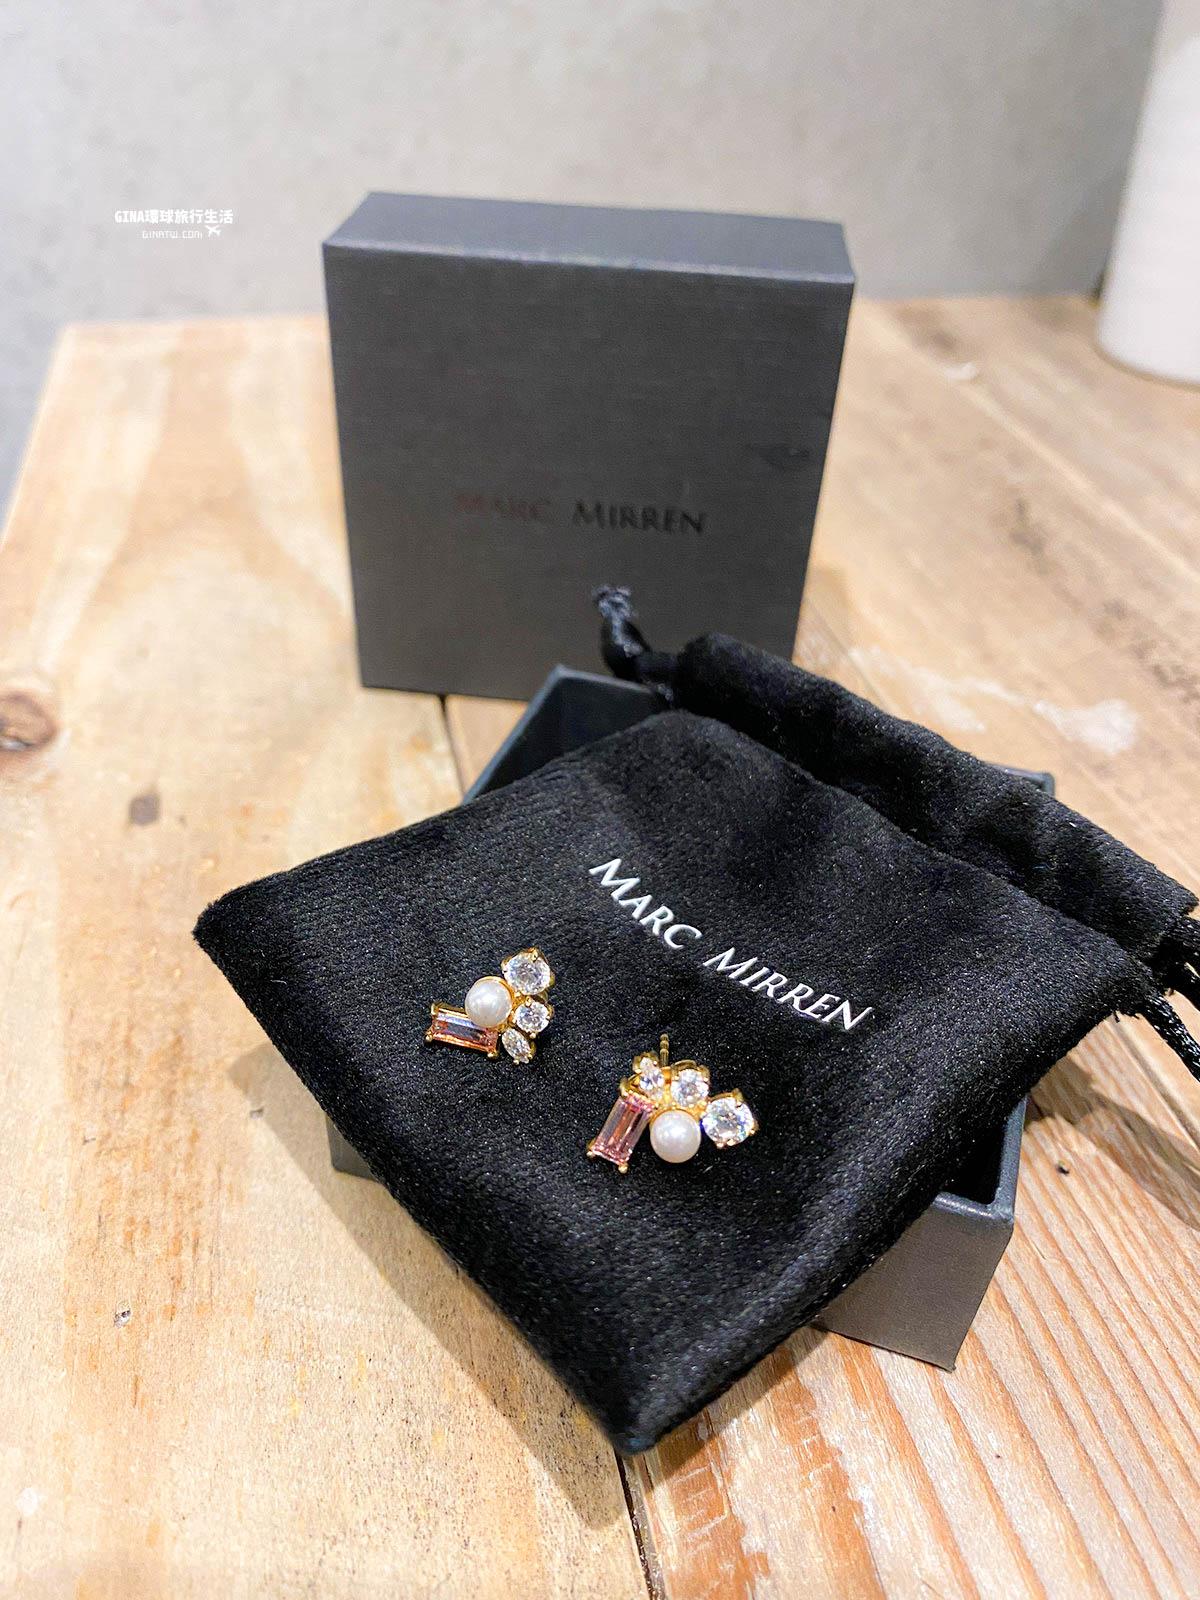 【Marc Mirren折扣碼】施華洛世奇寶石-北歐瑞典飾品|耳環、項鍊、首飾 @GINA環球旅行生活